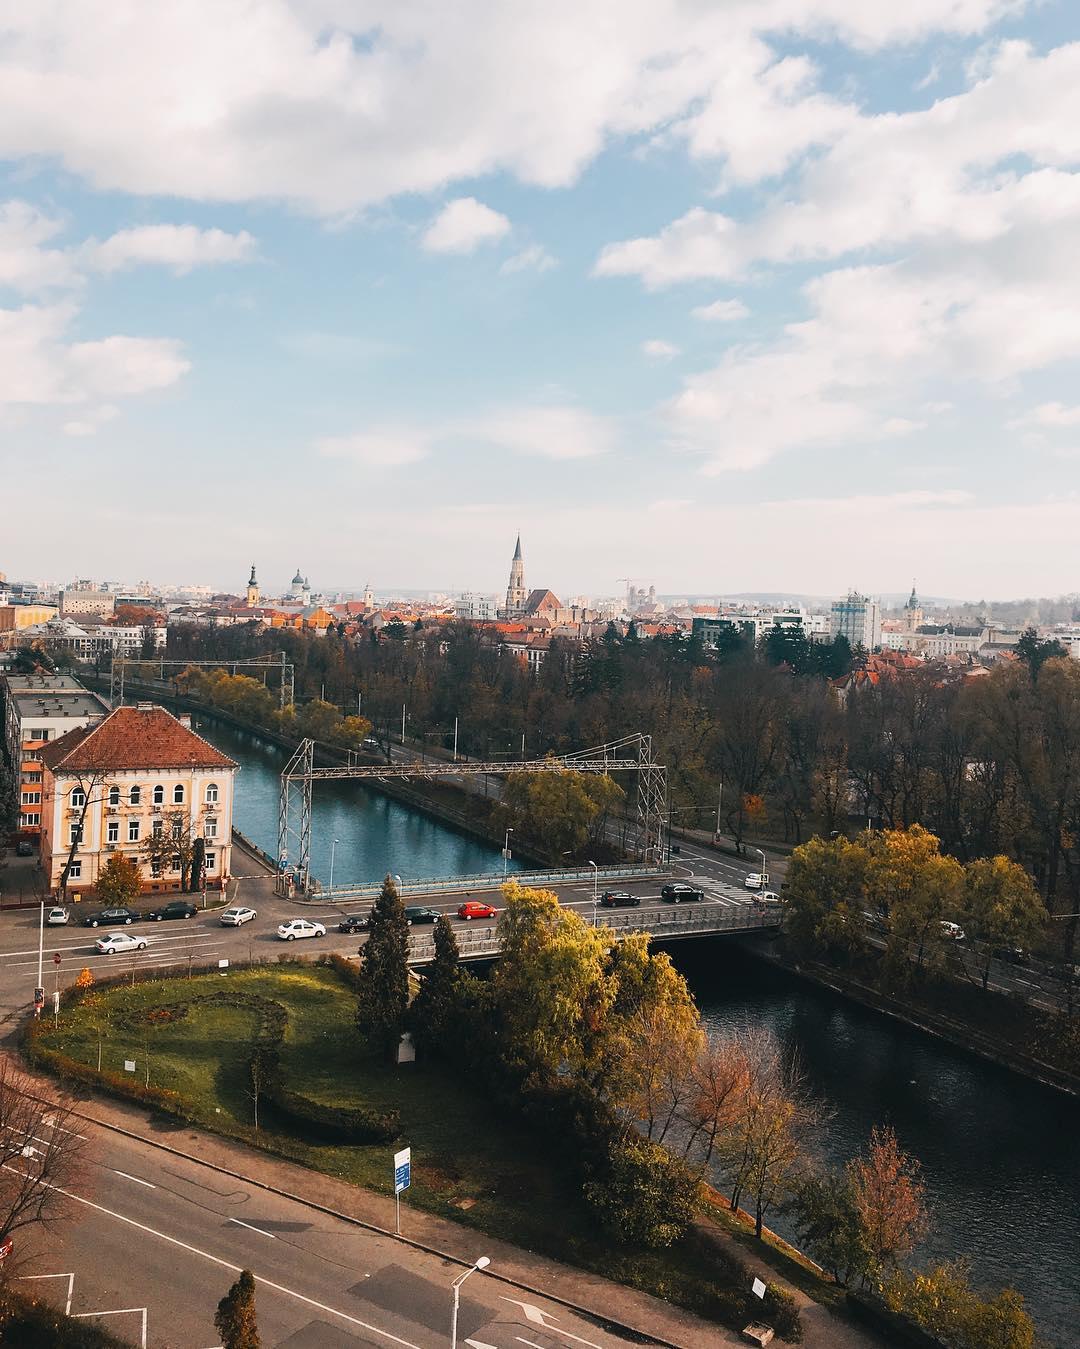 davidpanni Clujul in 13 fotografii ale lunii noiembrie